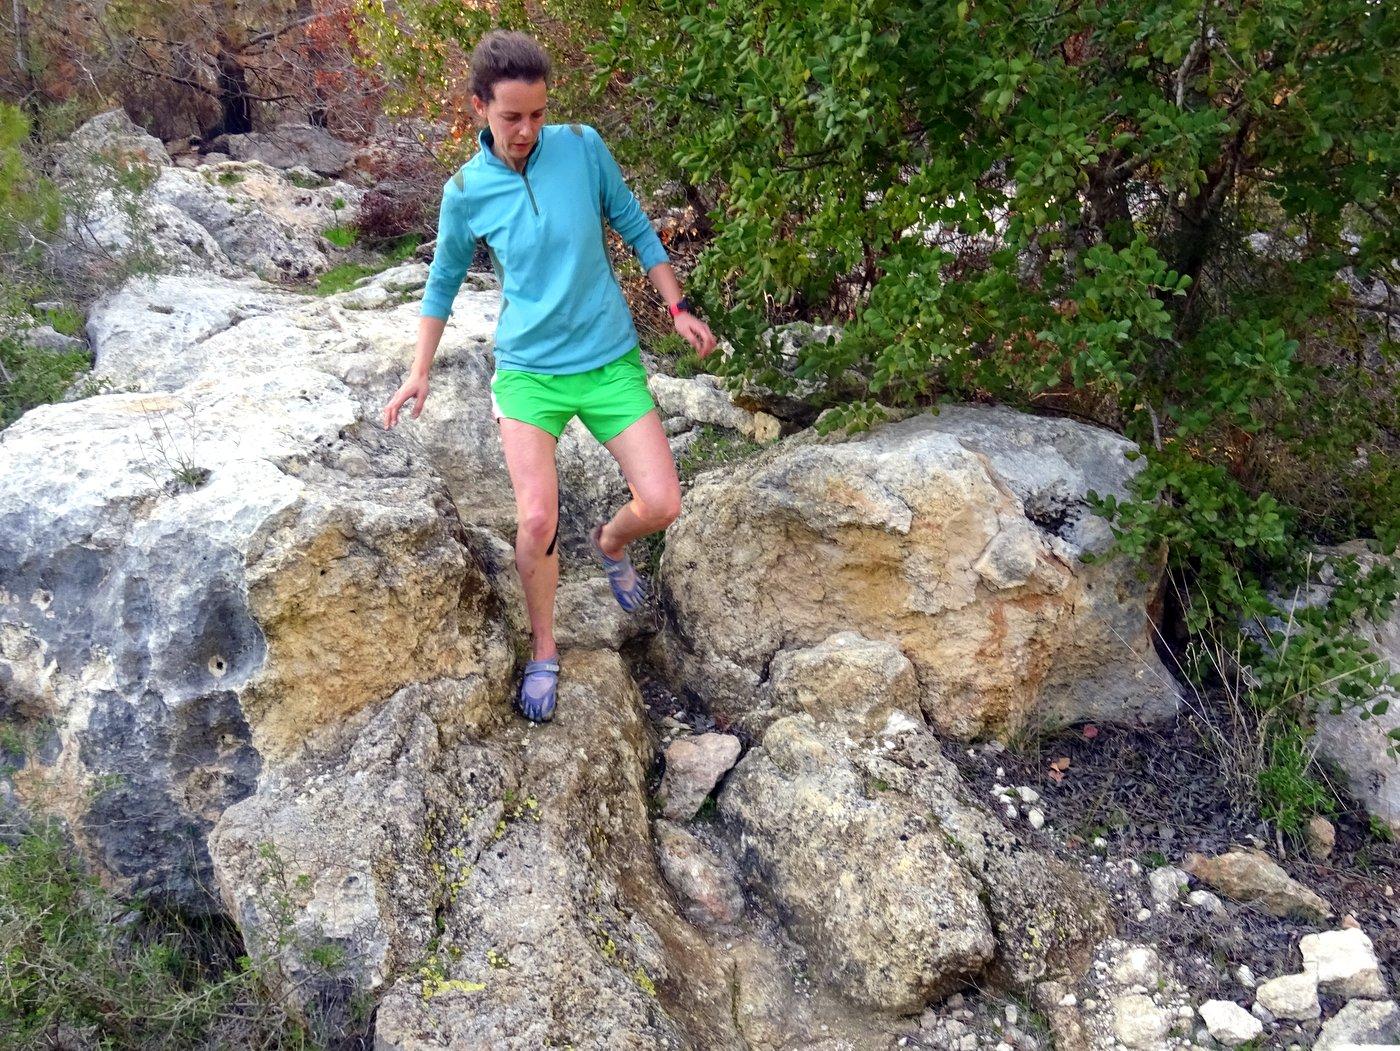 minimalistic and barefoot running